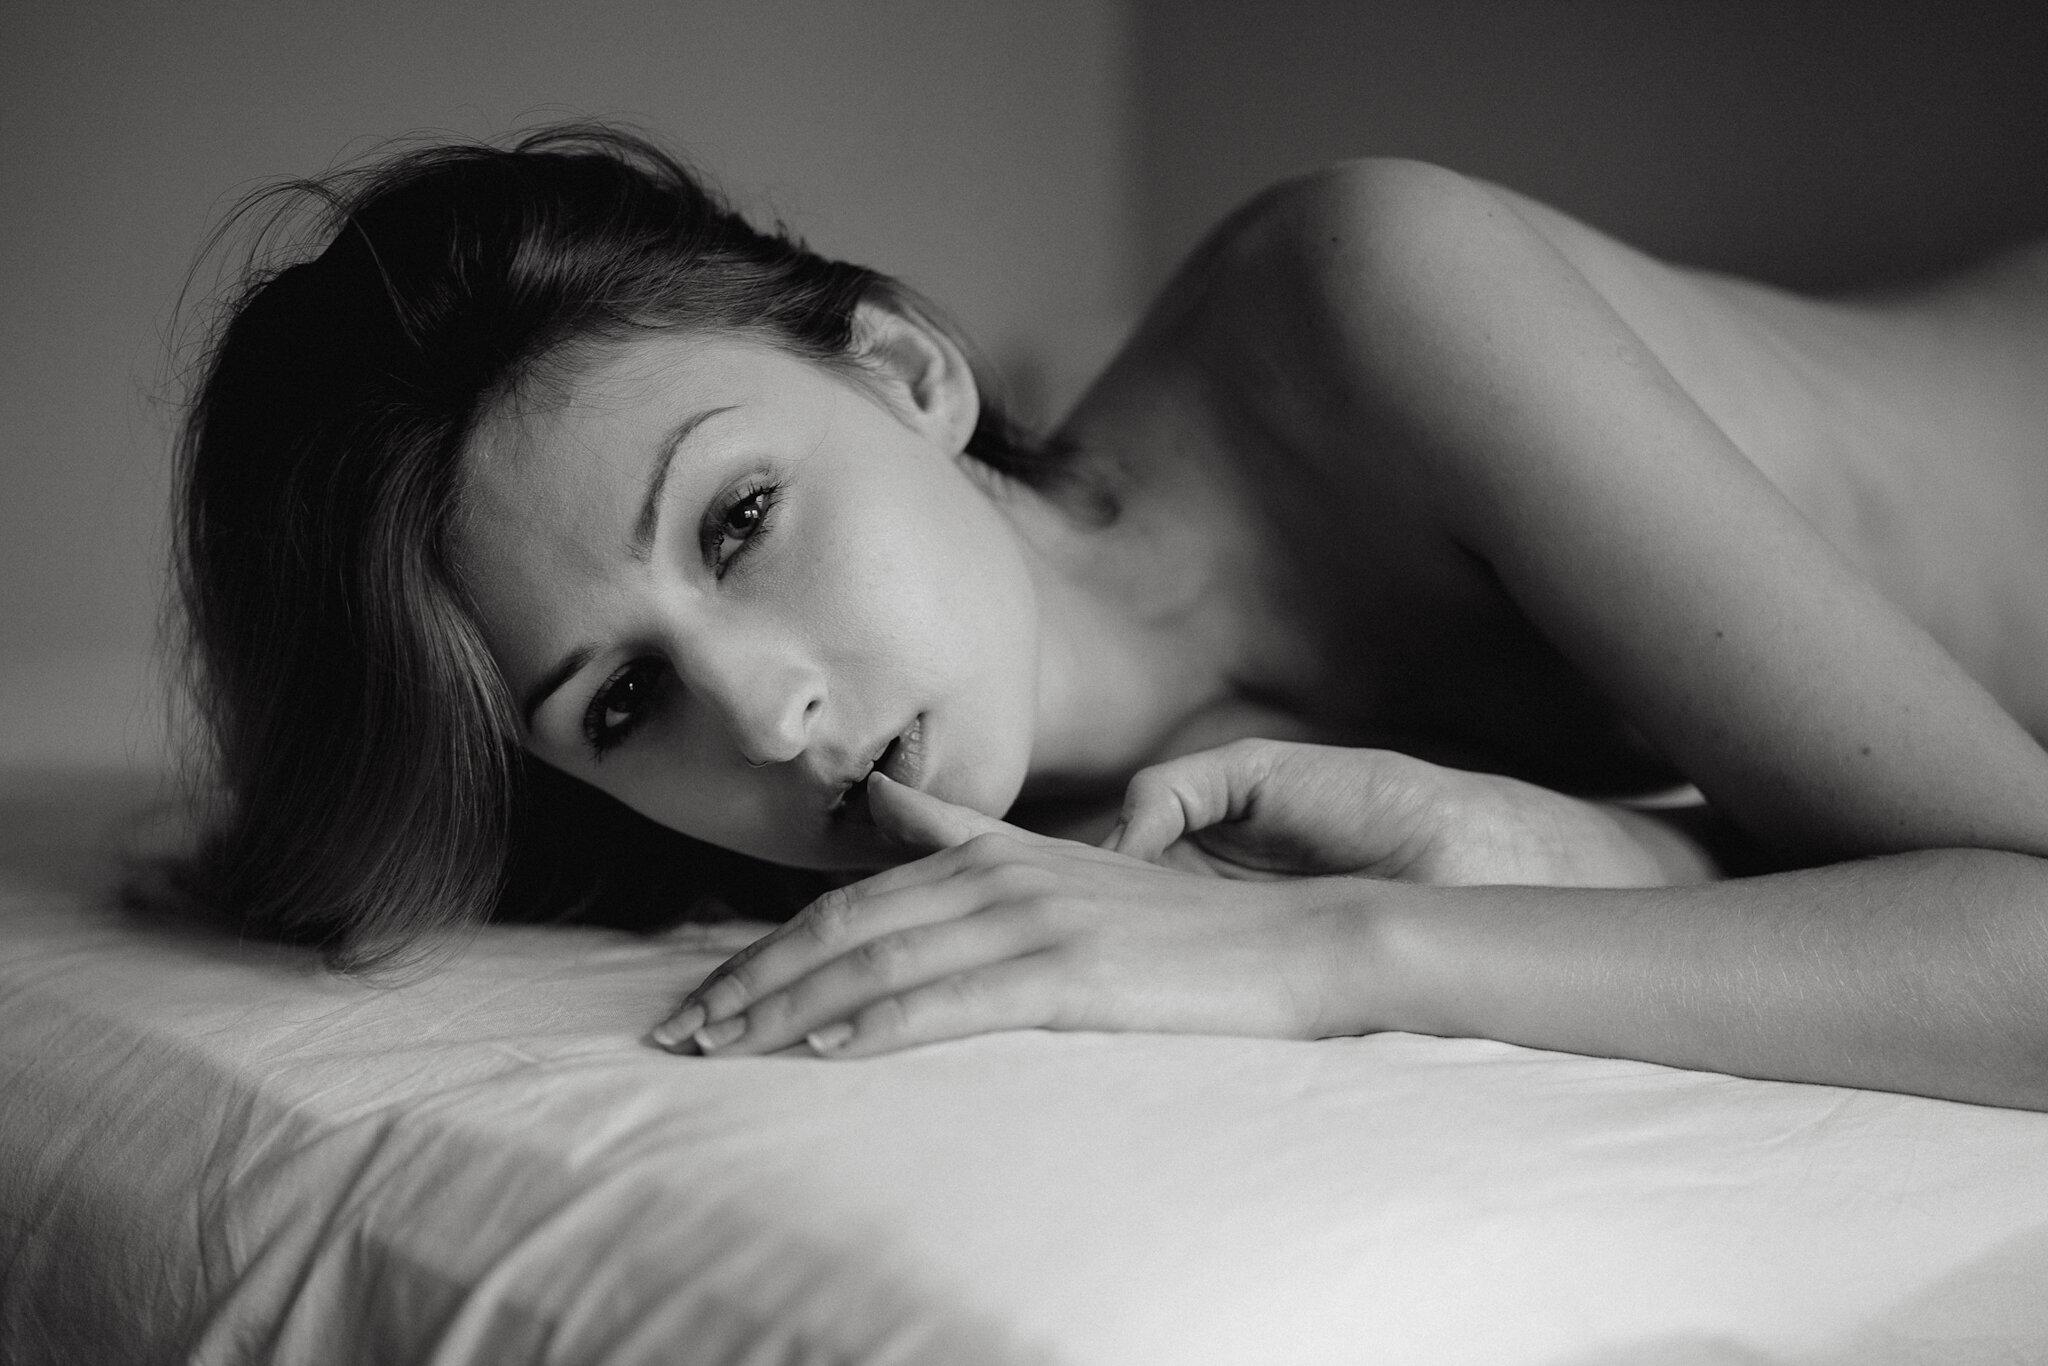 Monika Lipigórska by Marcin Krystyniak